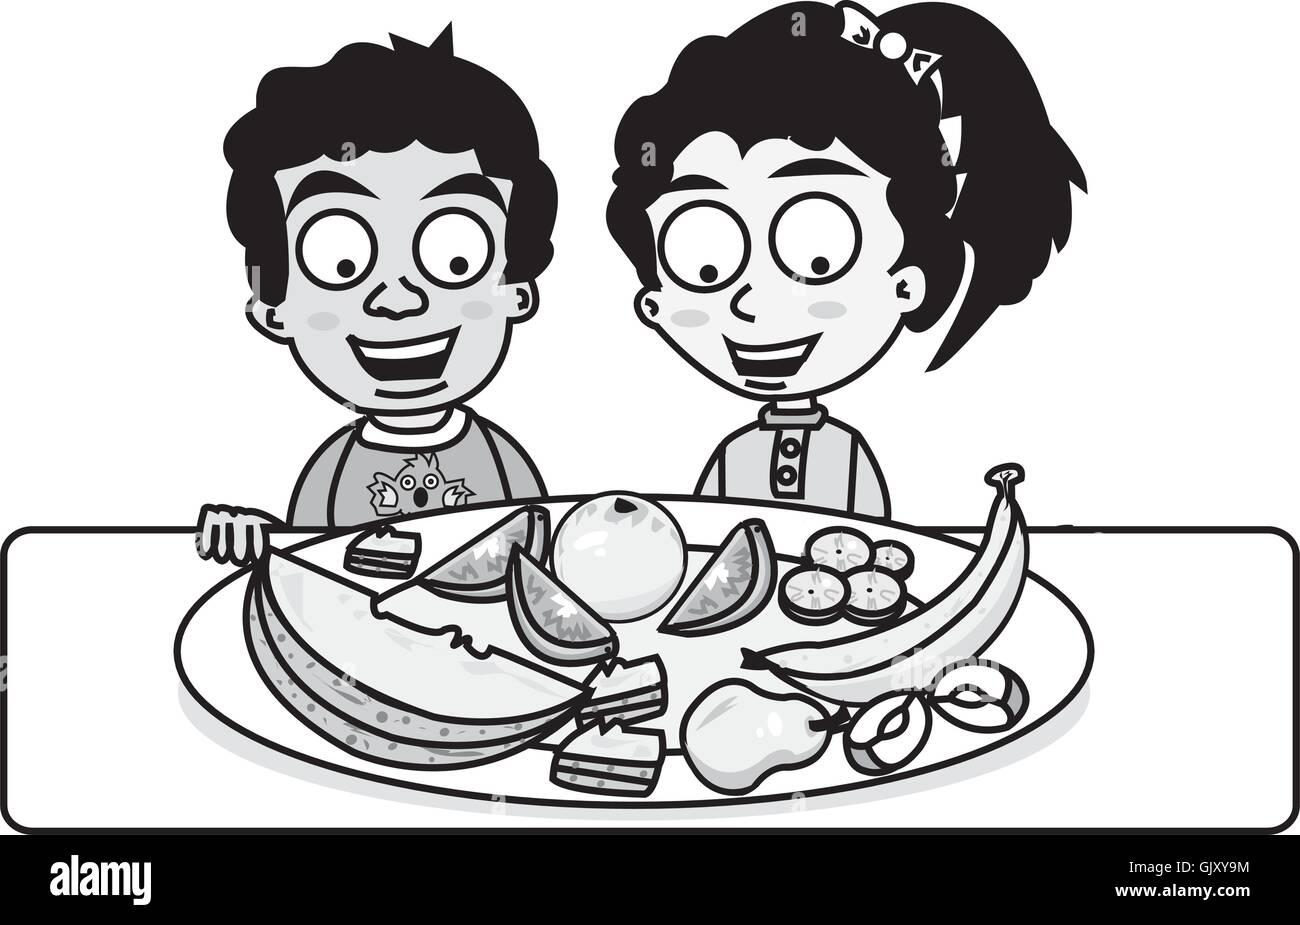 Ethnic Children Eating Healthy Stock Vector Image Art Alamy